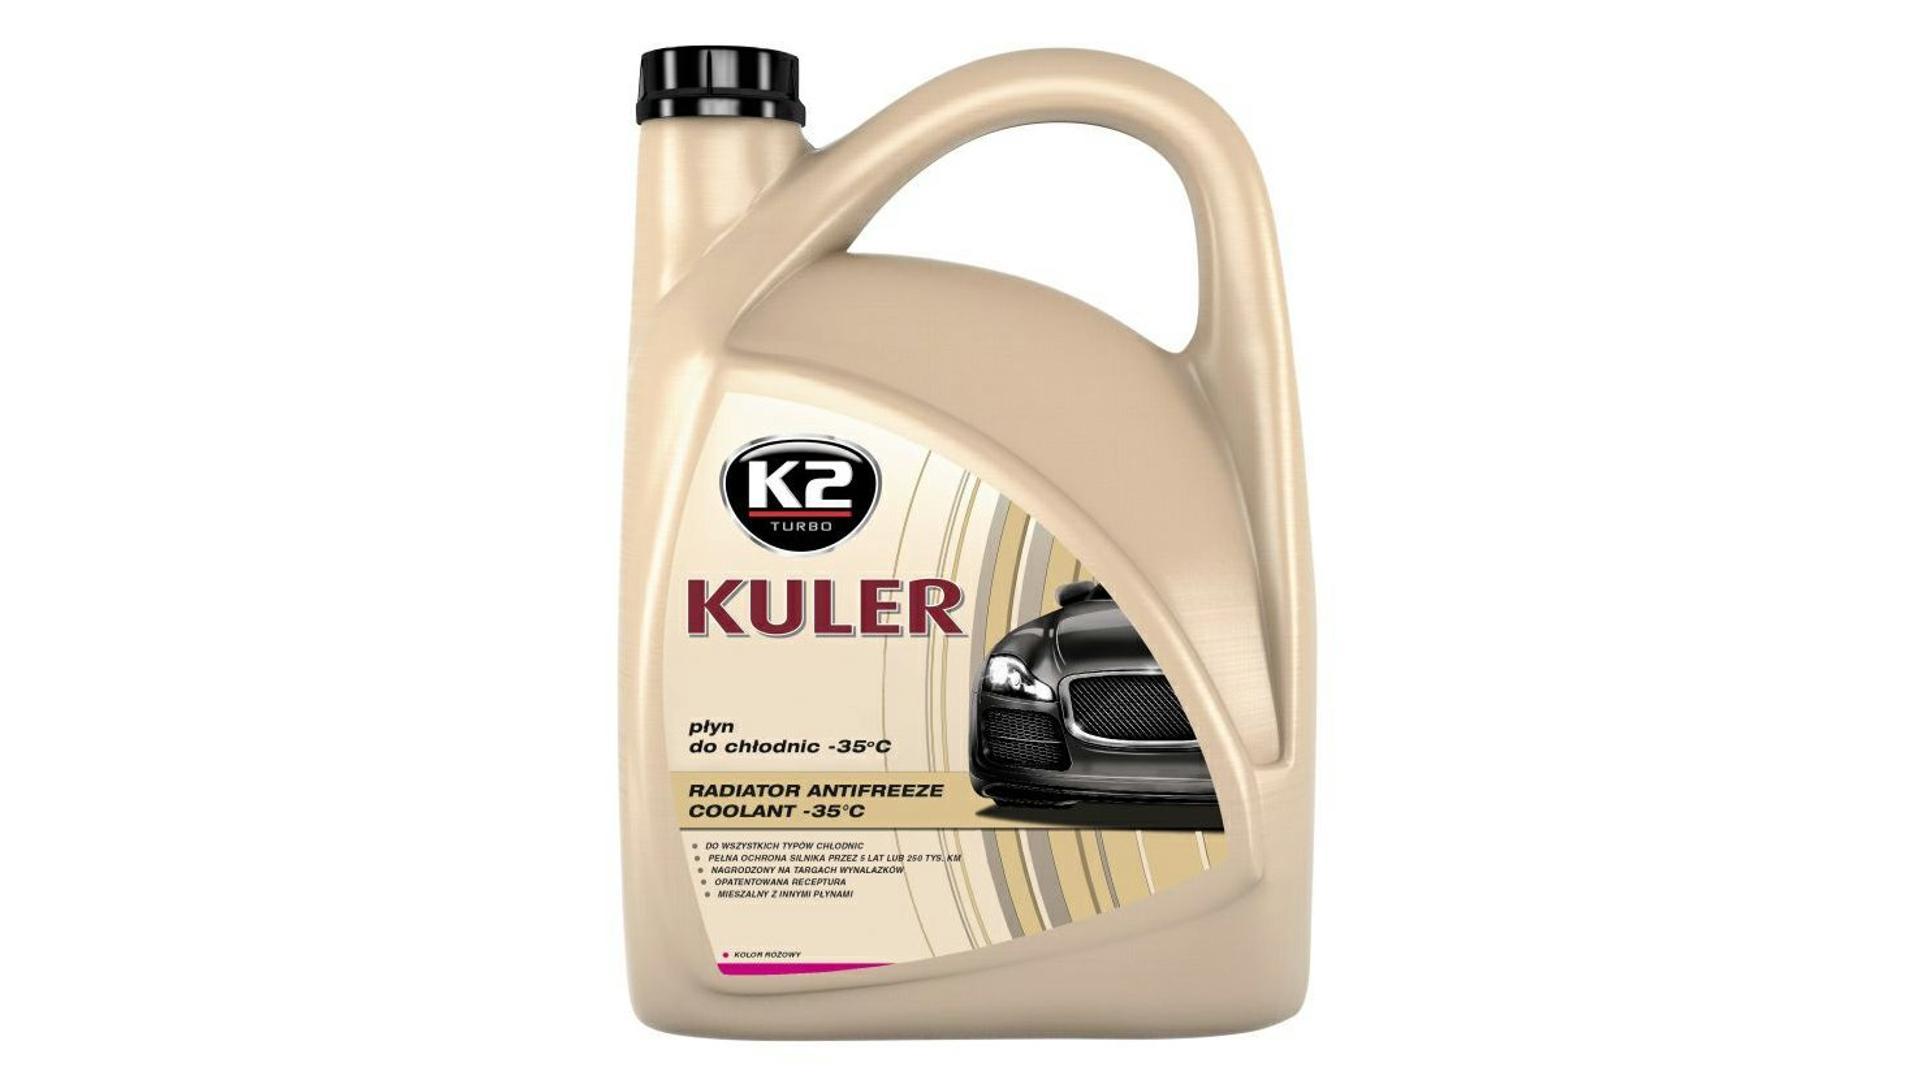 K2 Kuler G13 RUŽOVÁ 5 l - nemrznúca kvapalina do chladiča do -35 ° C